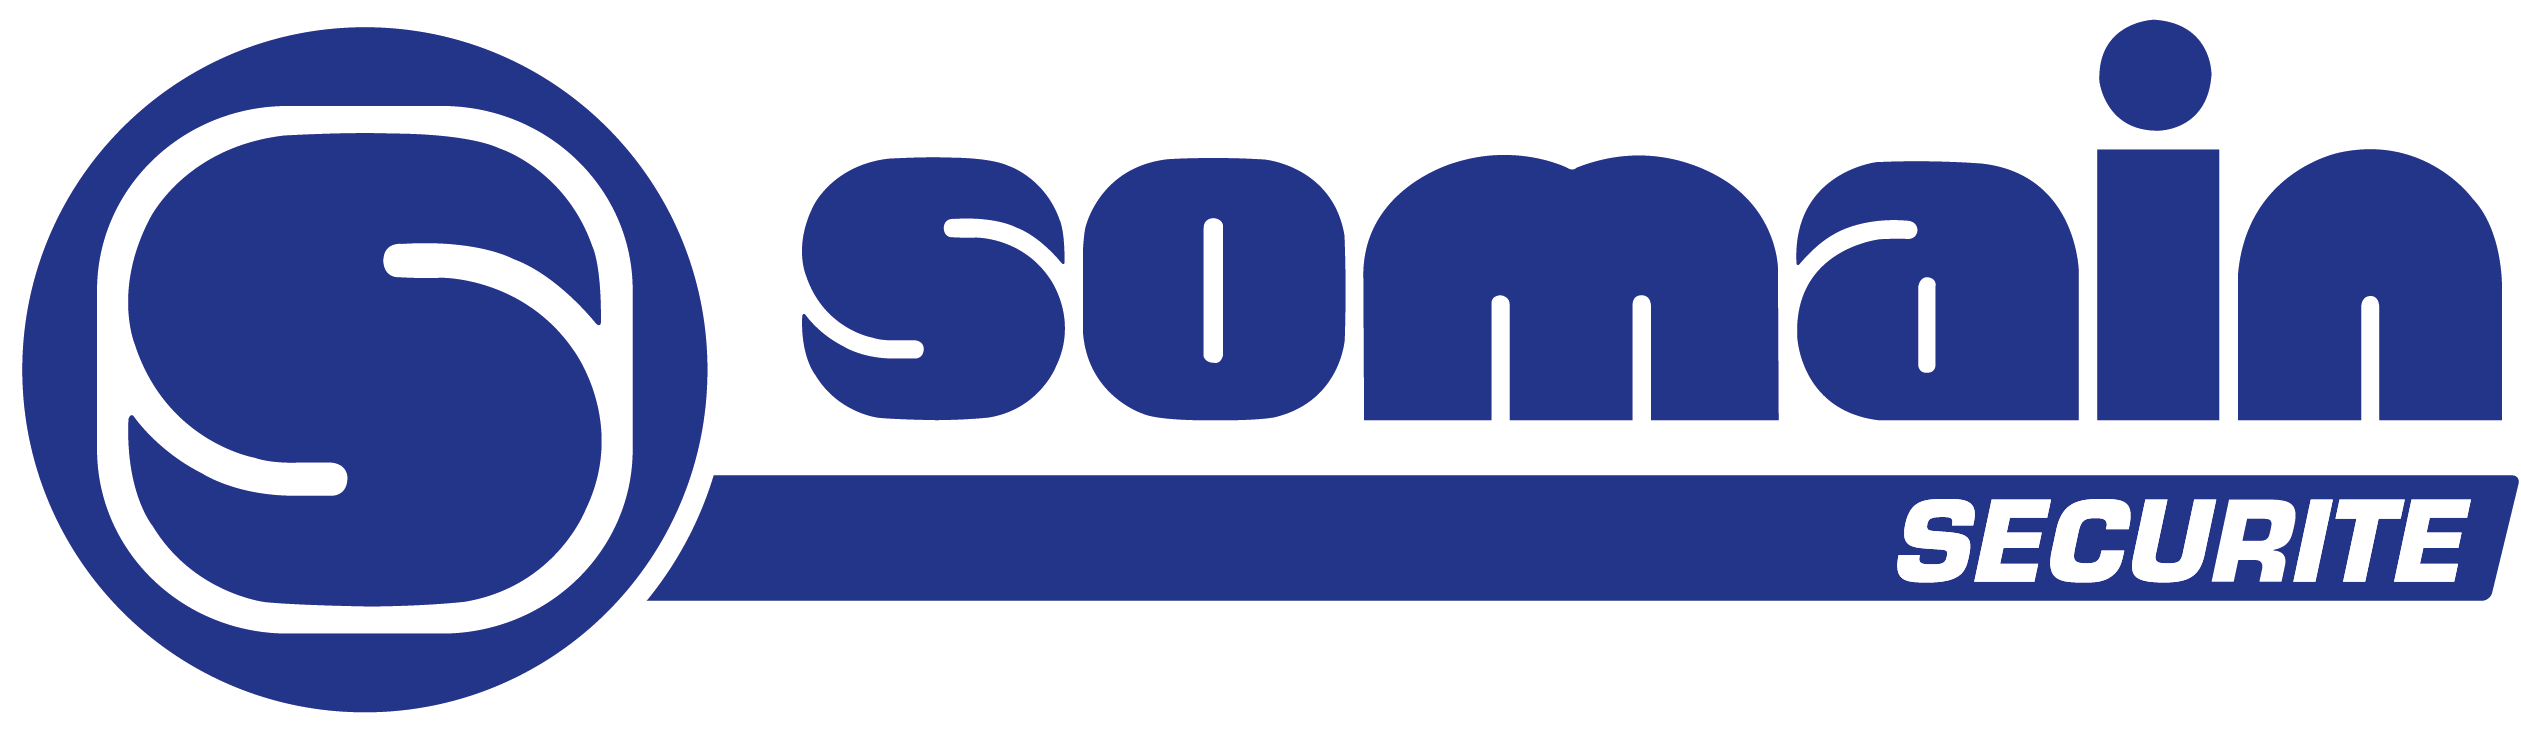 SOMAIN-SECURITE